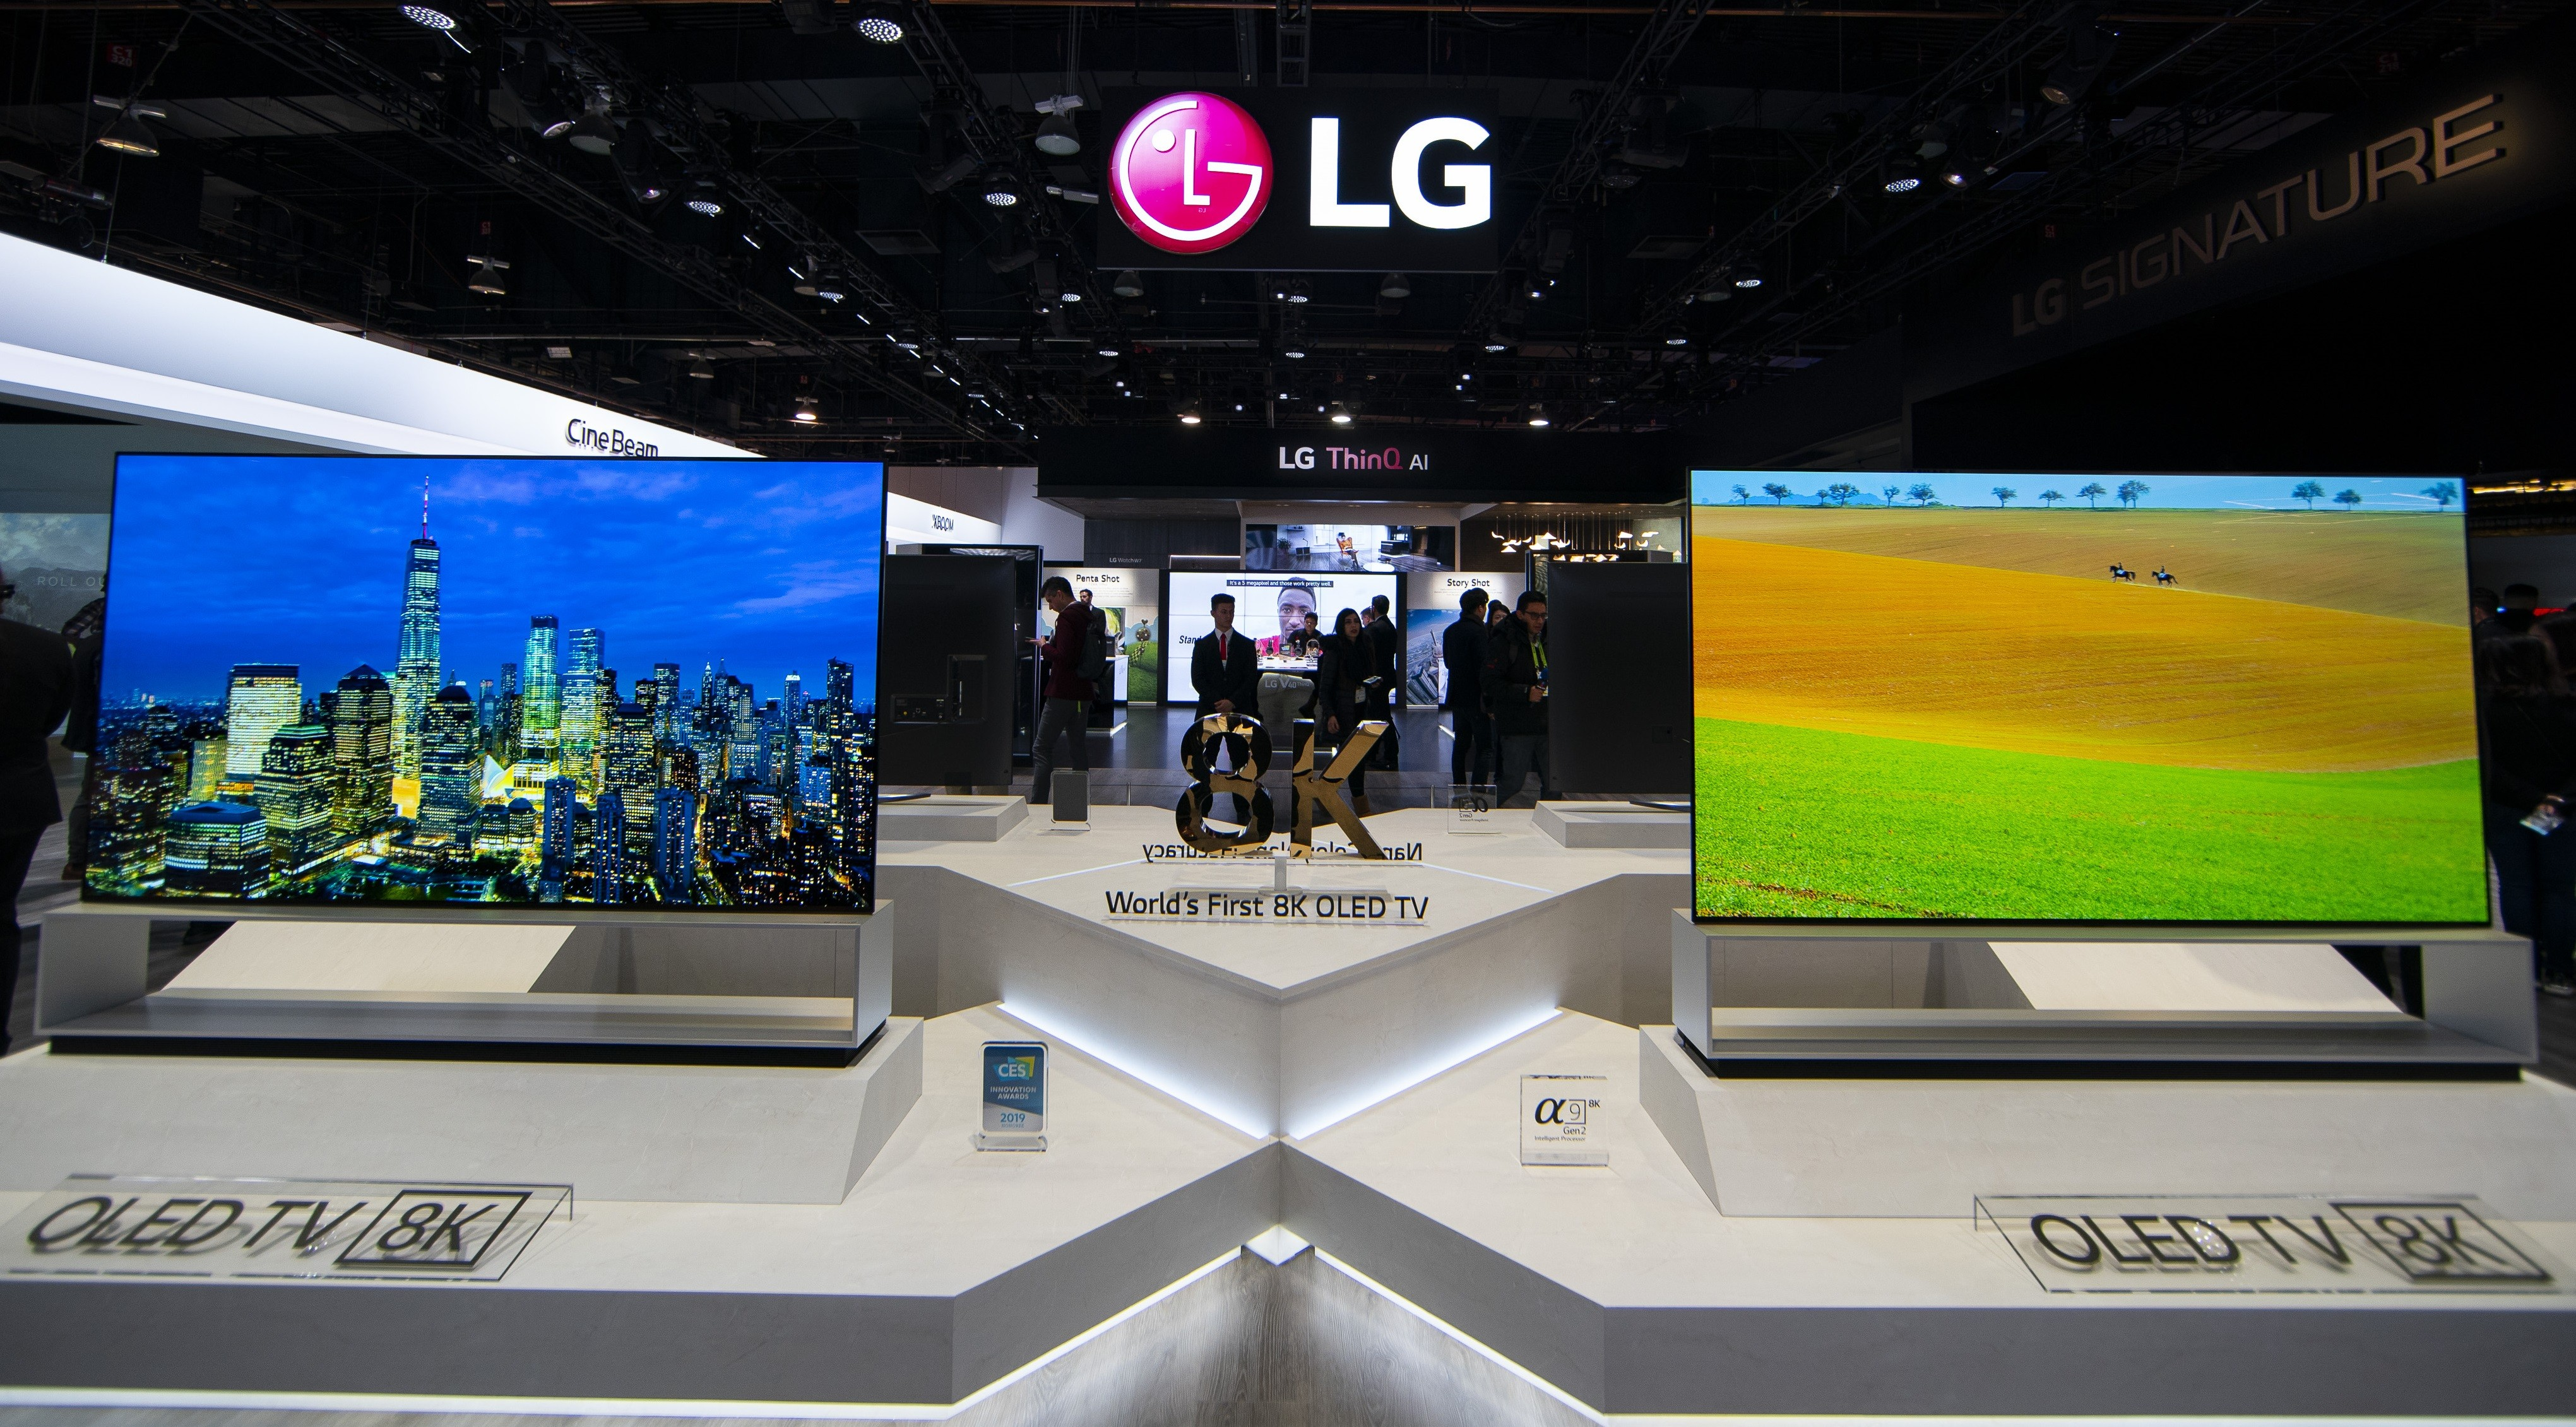 LG ANNOUNCES START OF SALES OF WORLD'S FIRST 8K OLED TV   LG Newsroom